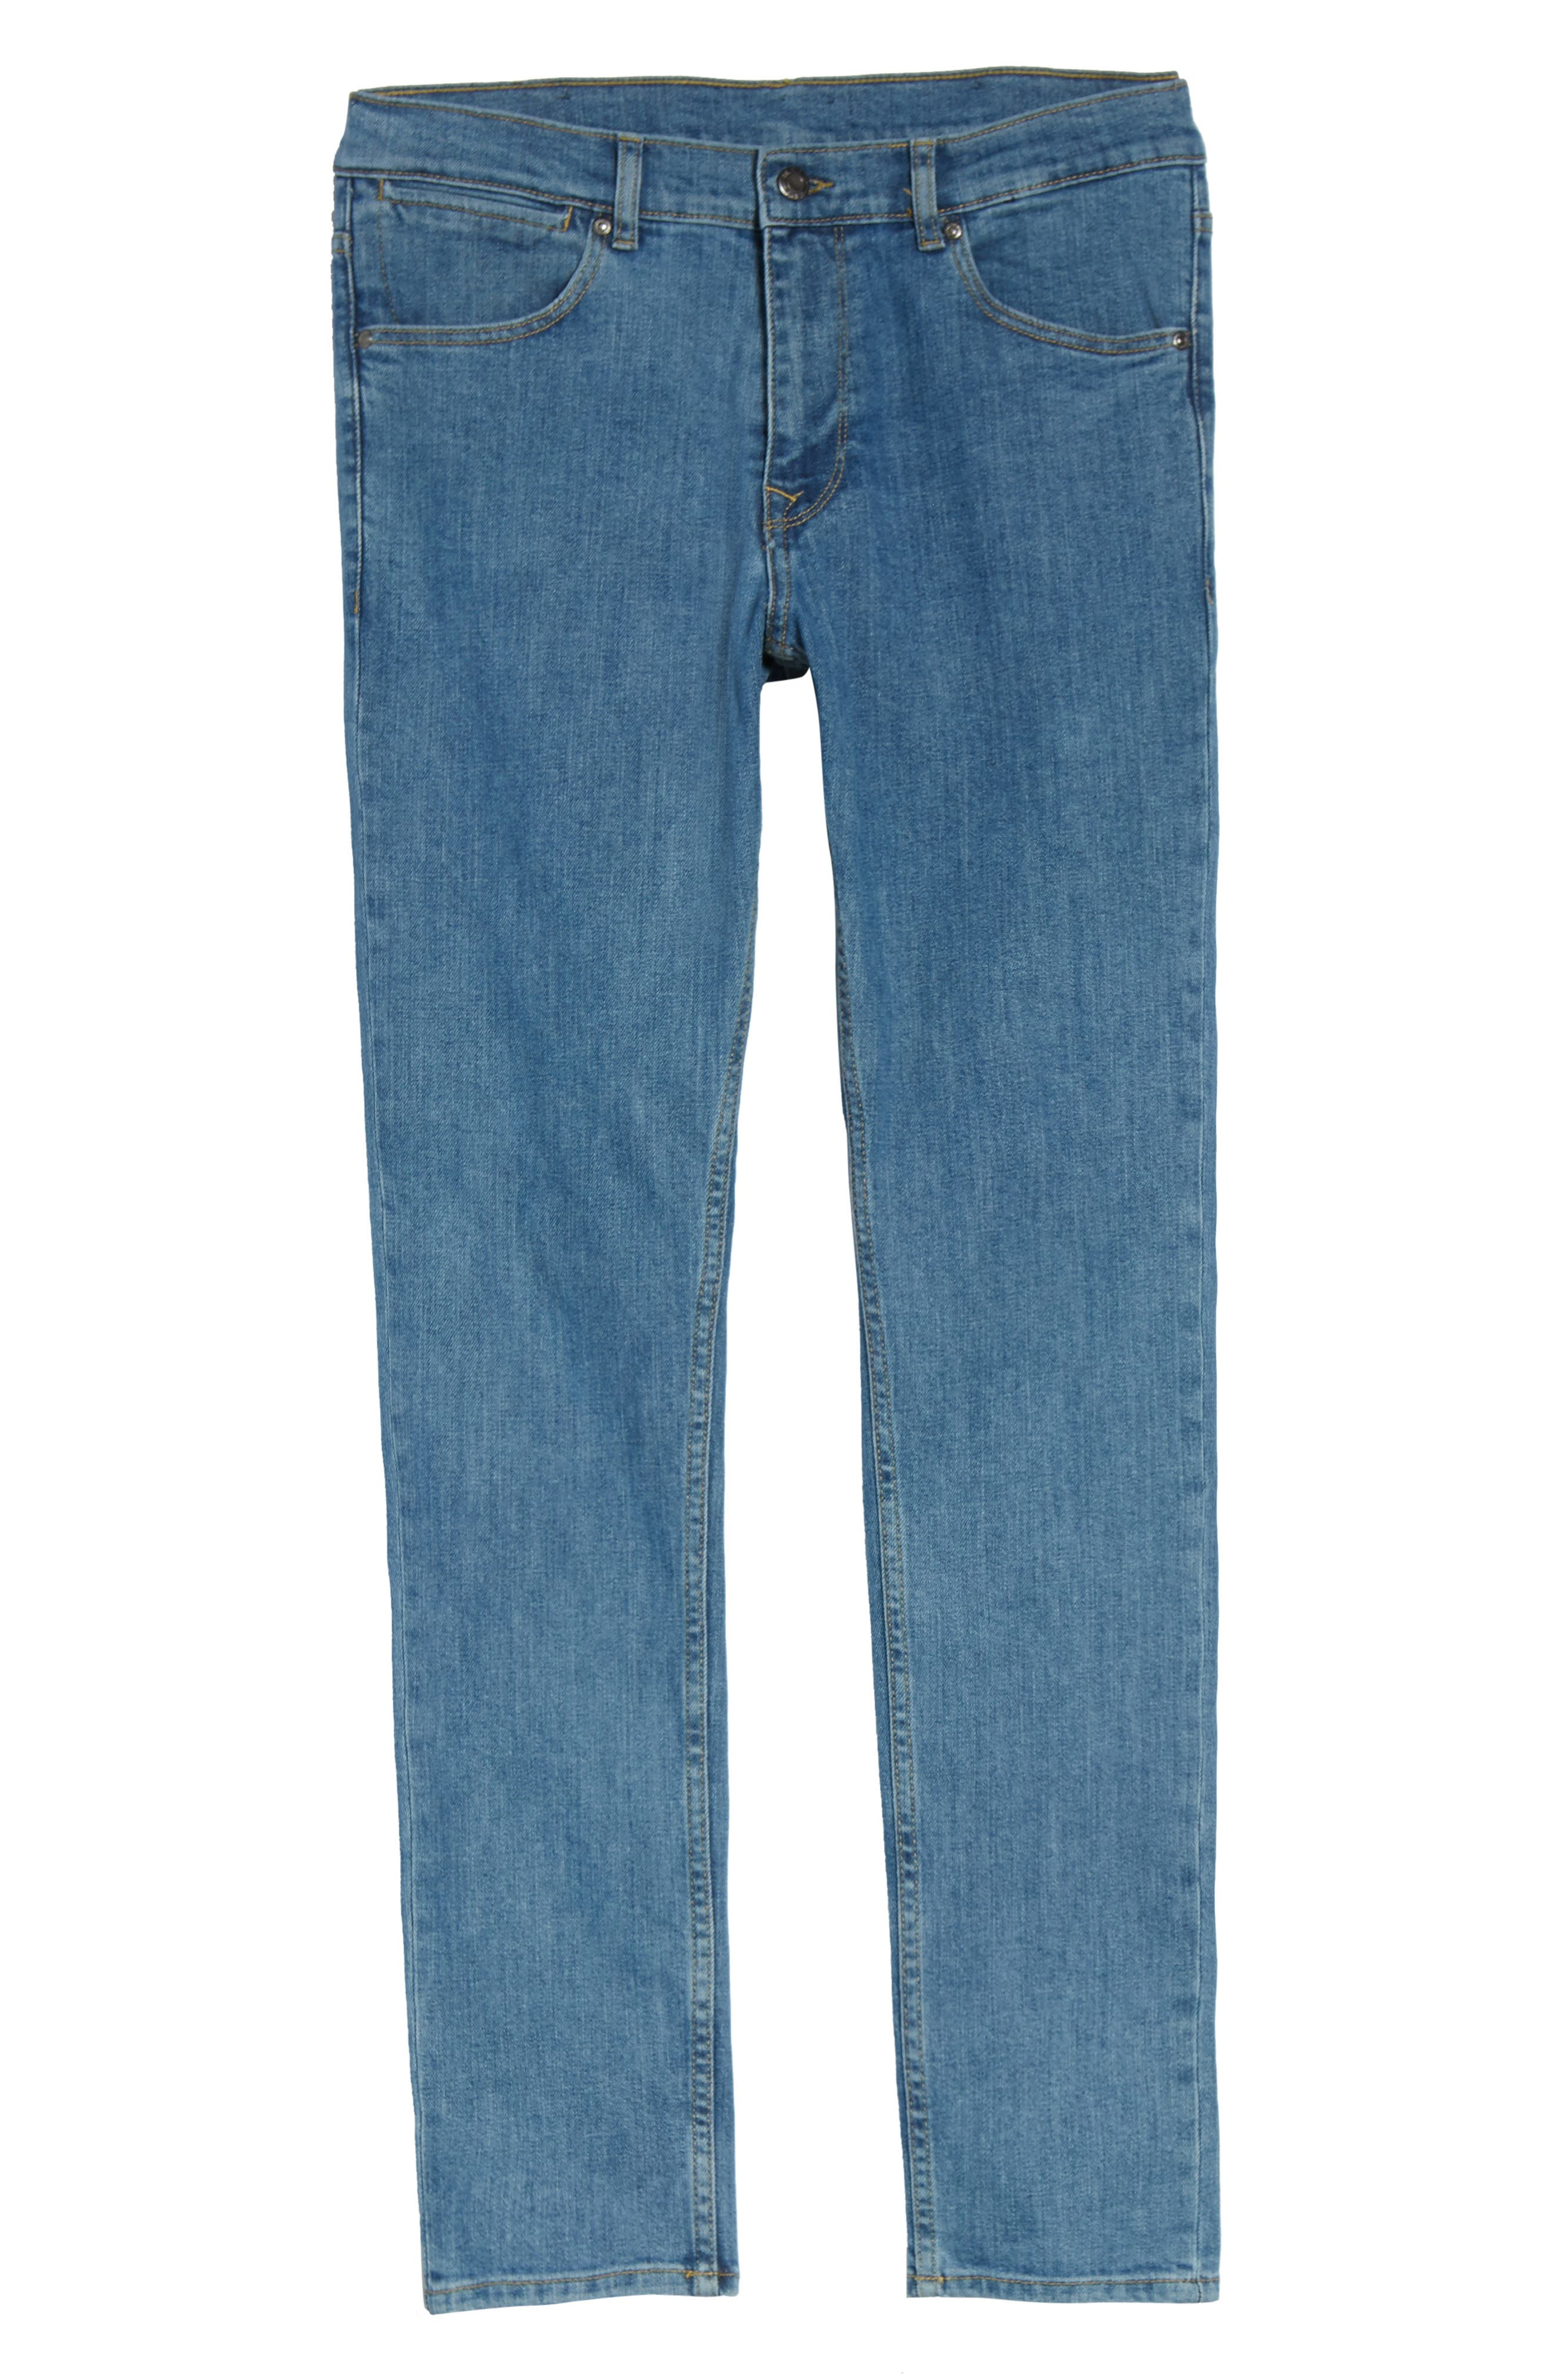 Clark Slim Straight Fit Jeans,                             Alternate thumbnail 6, color,